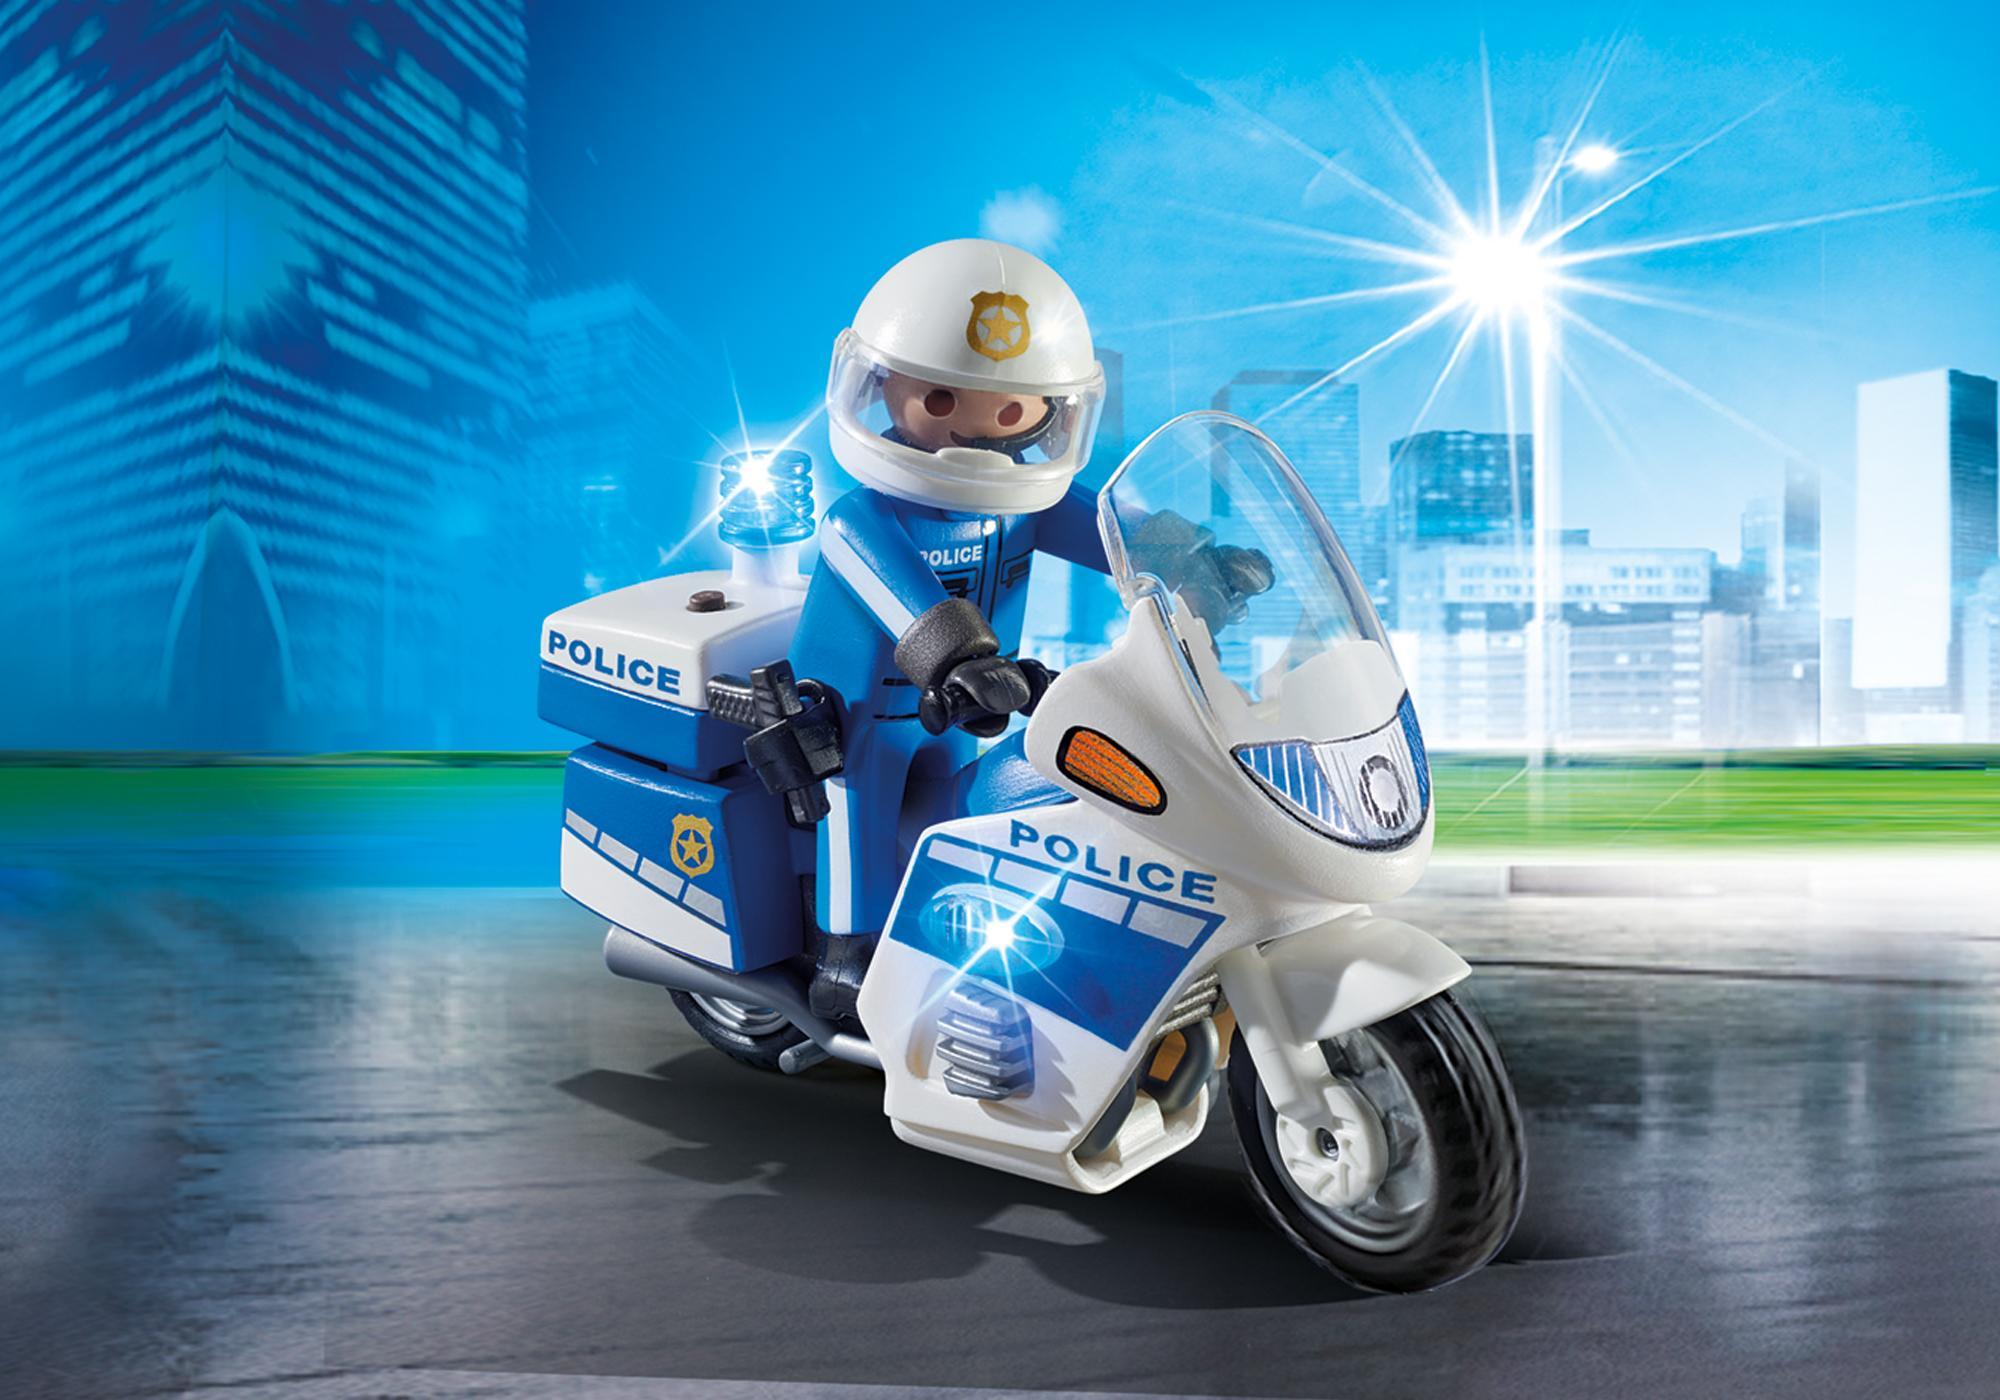 http://media.playmobil.com/i/playmobil/6923_product_detail/Int. Motorradstreife mit LED-Blinklicht